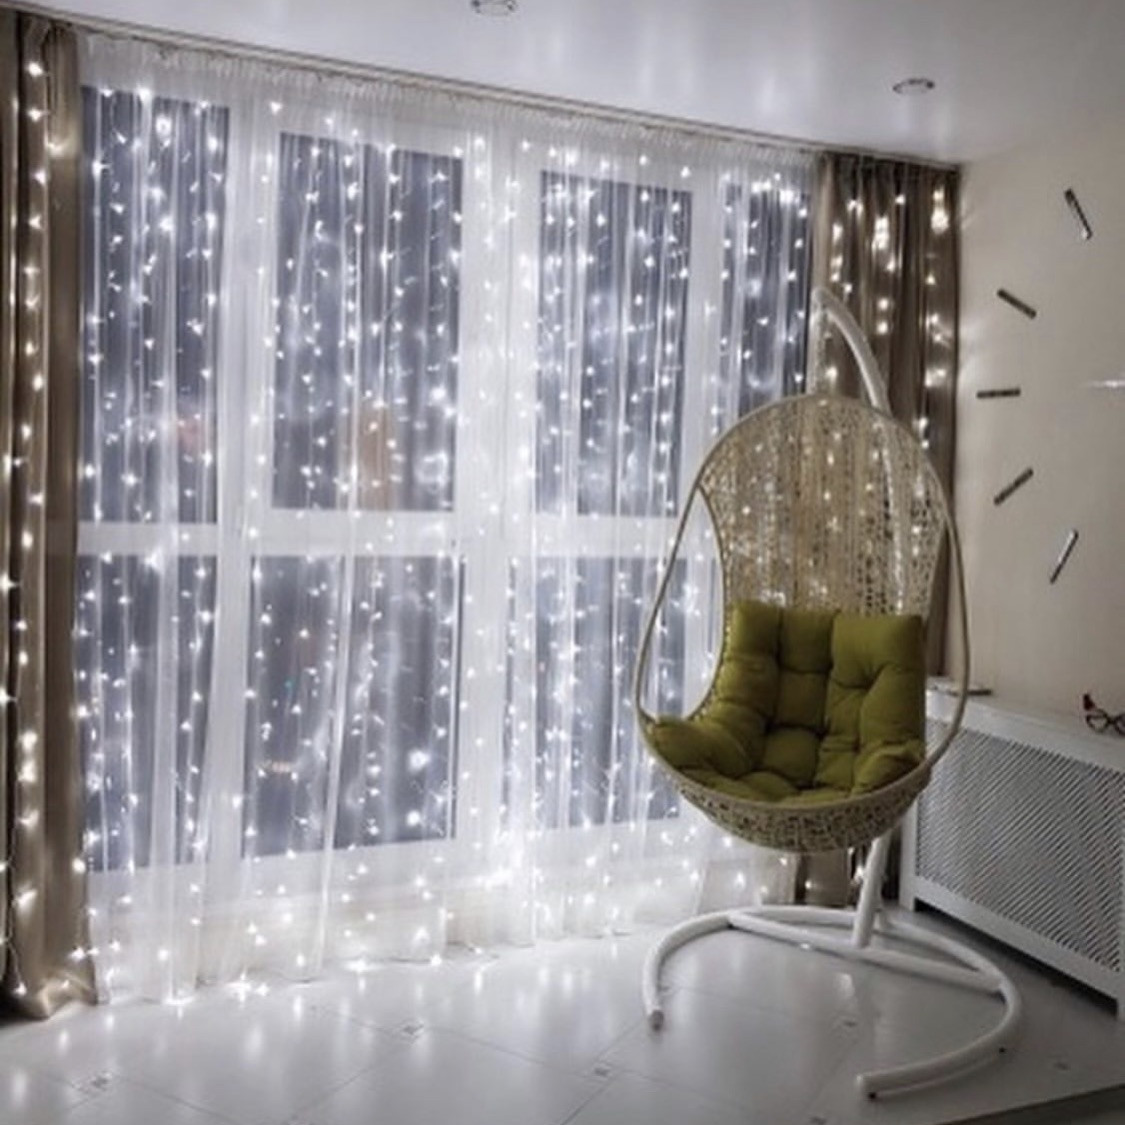 Гирлянда Водопад 2.5 м х 2.5 м, 480 LED, Соединяемая (Штора, Занавес, Curtain lights)